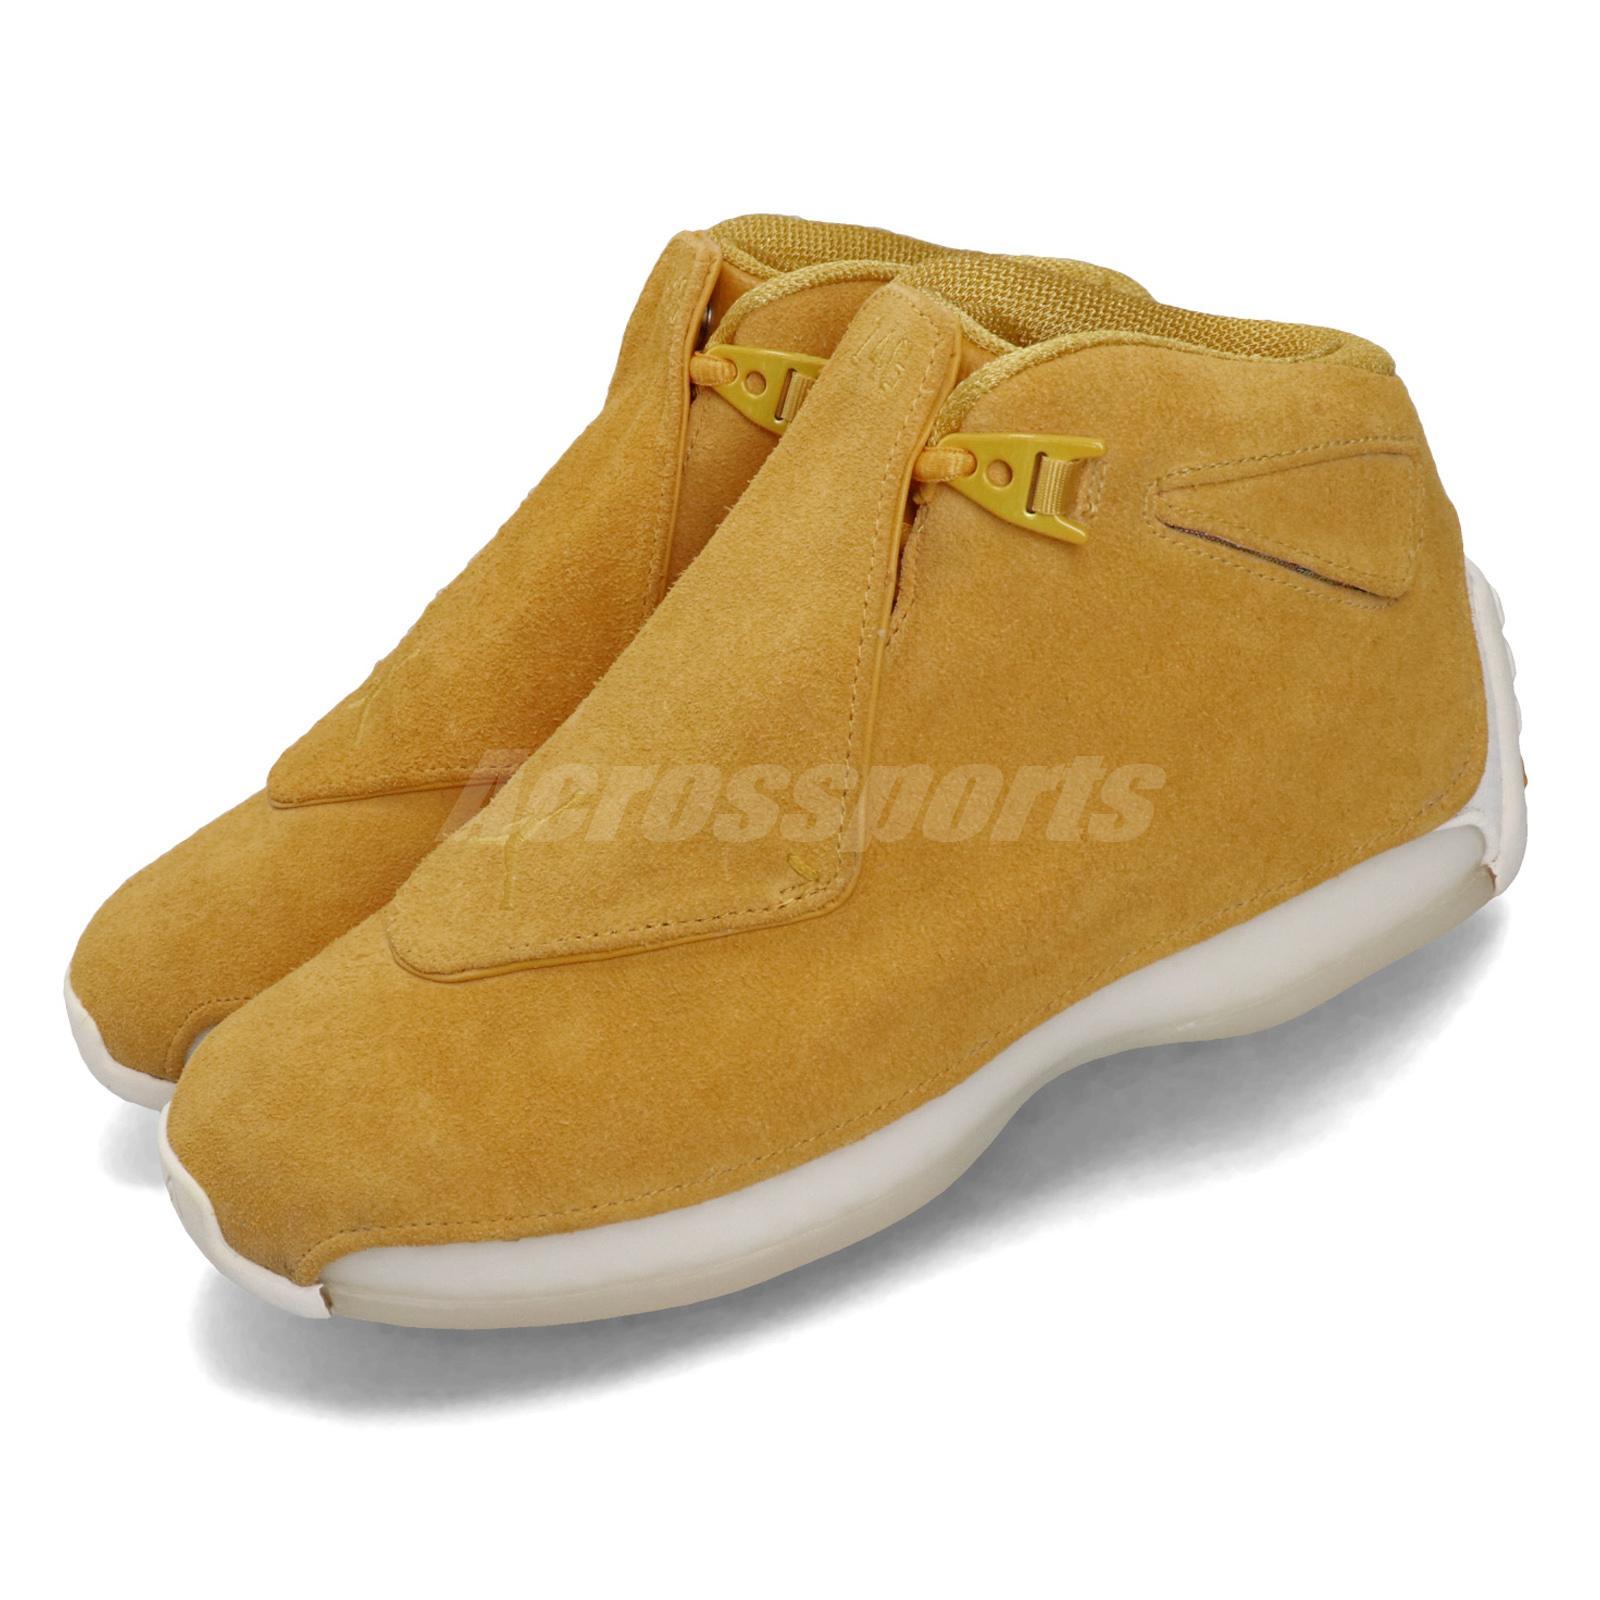 4c3bb70681b540 Nike Air Jordan 18 Retro Yellow Ochre Suede Mens Basketball Shoes ...